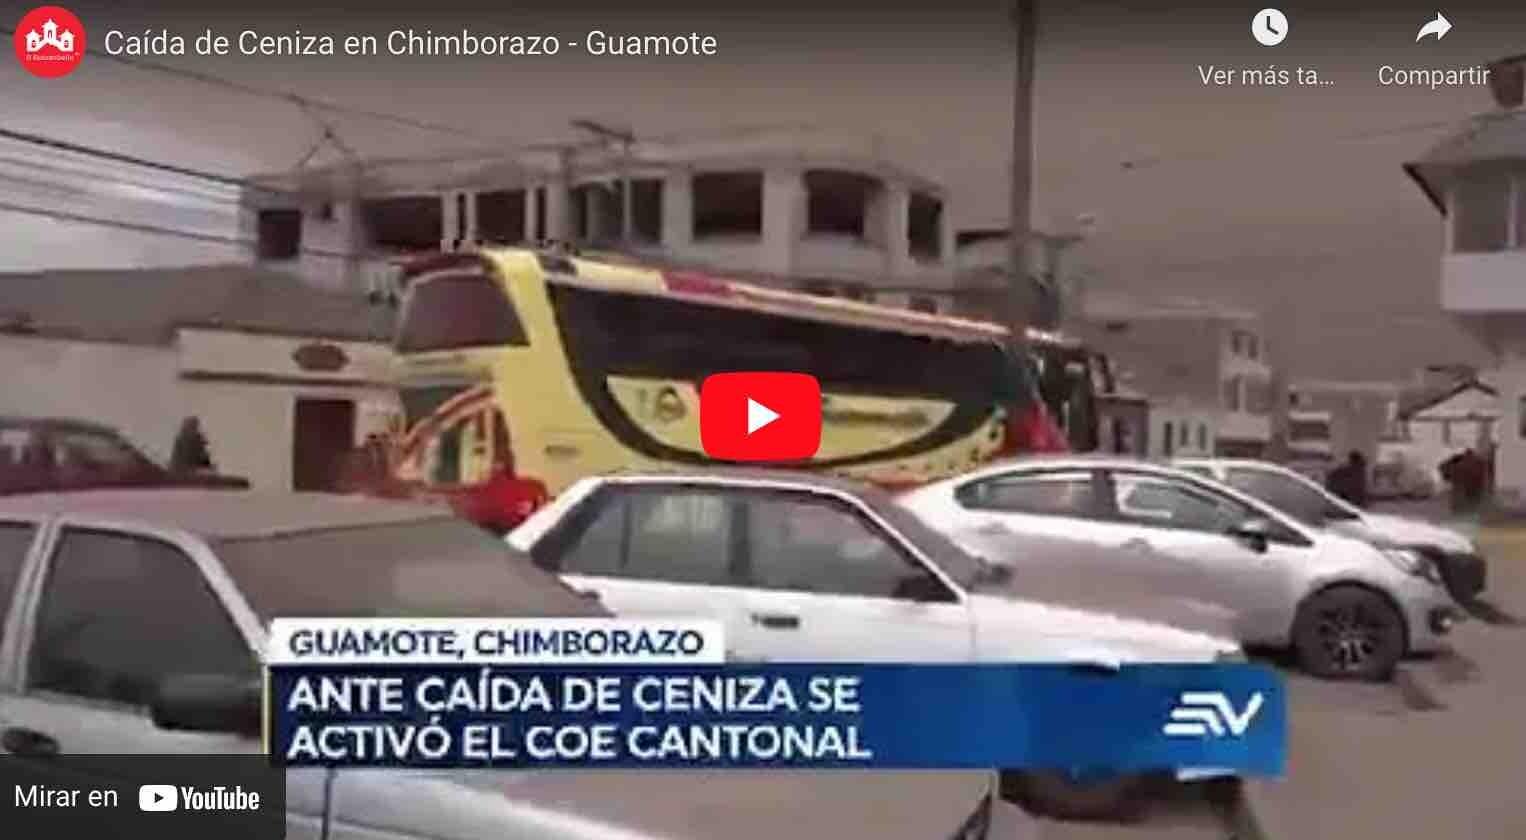 VIDEO: Hoy, así cayó ceniza en Chimborazo – Guamote